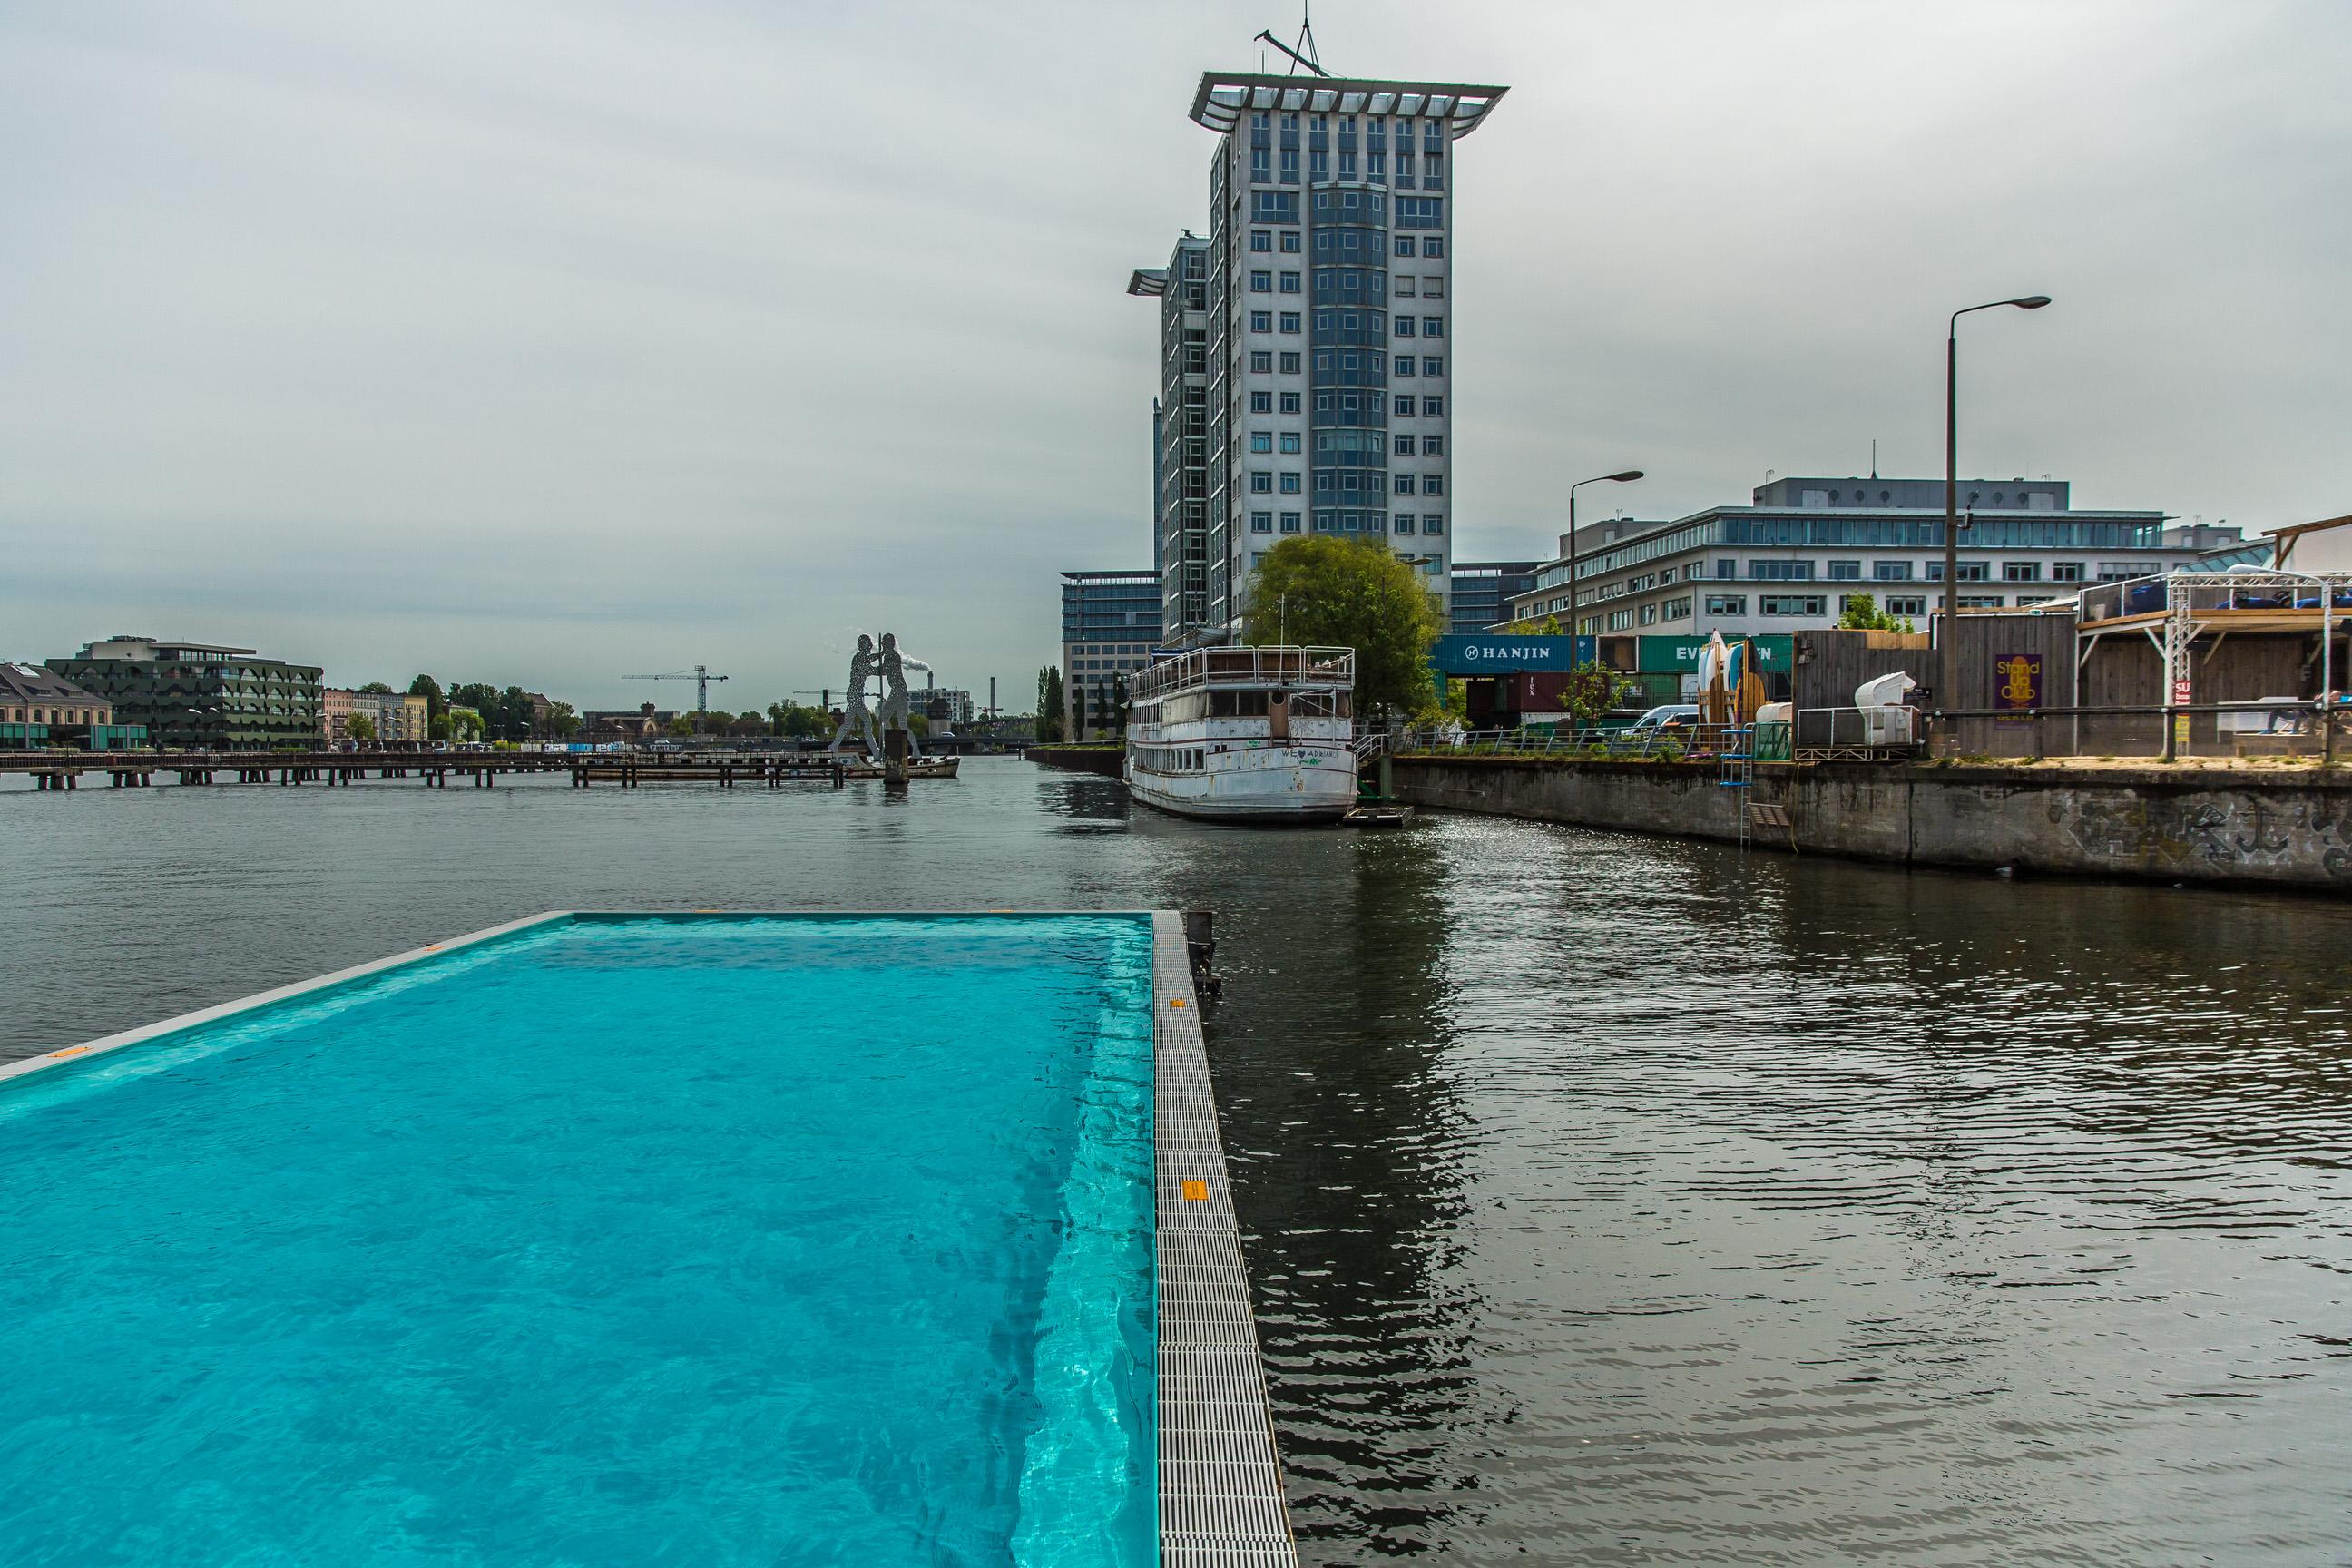 badeschiff berlin spree schwimmbad stadtstrand berlin. Black Bedroom Furniture Sets. Home Design Ideas